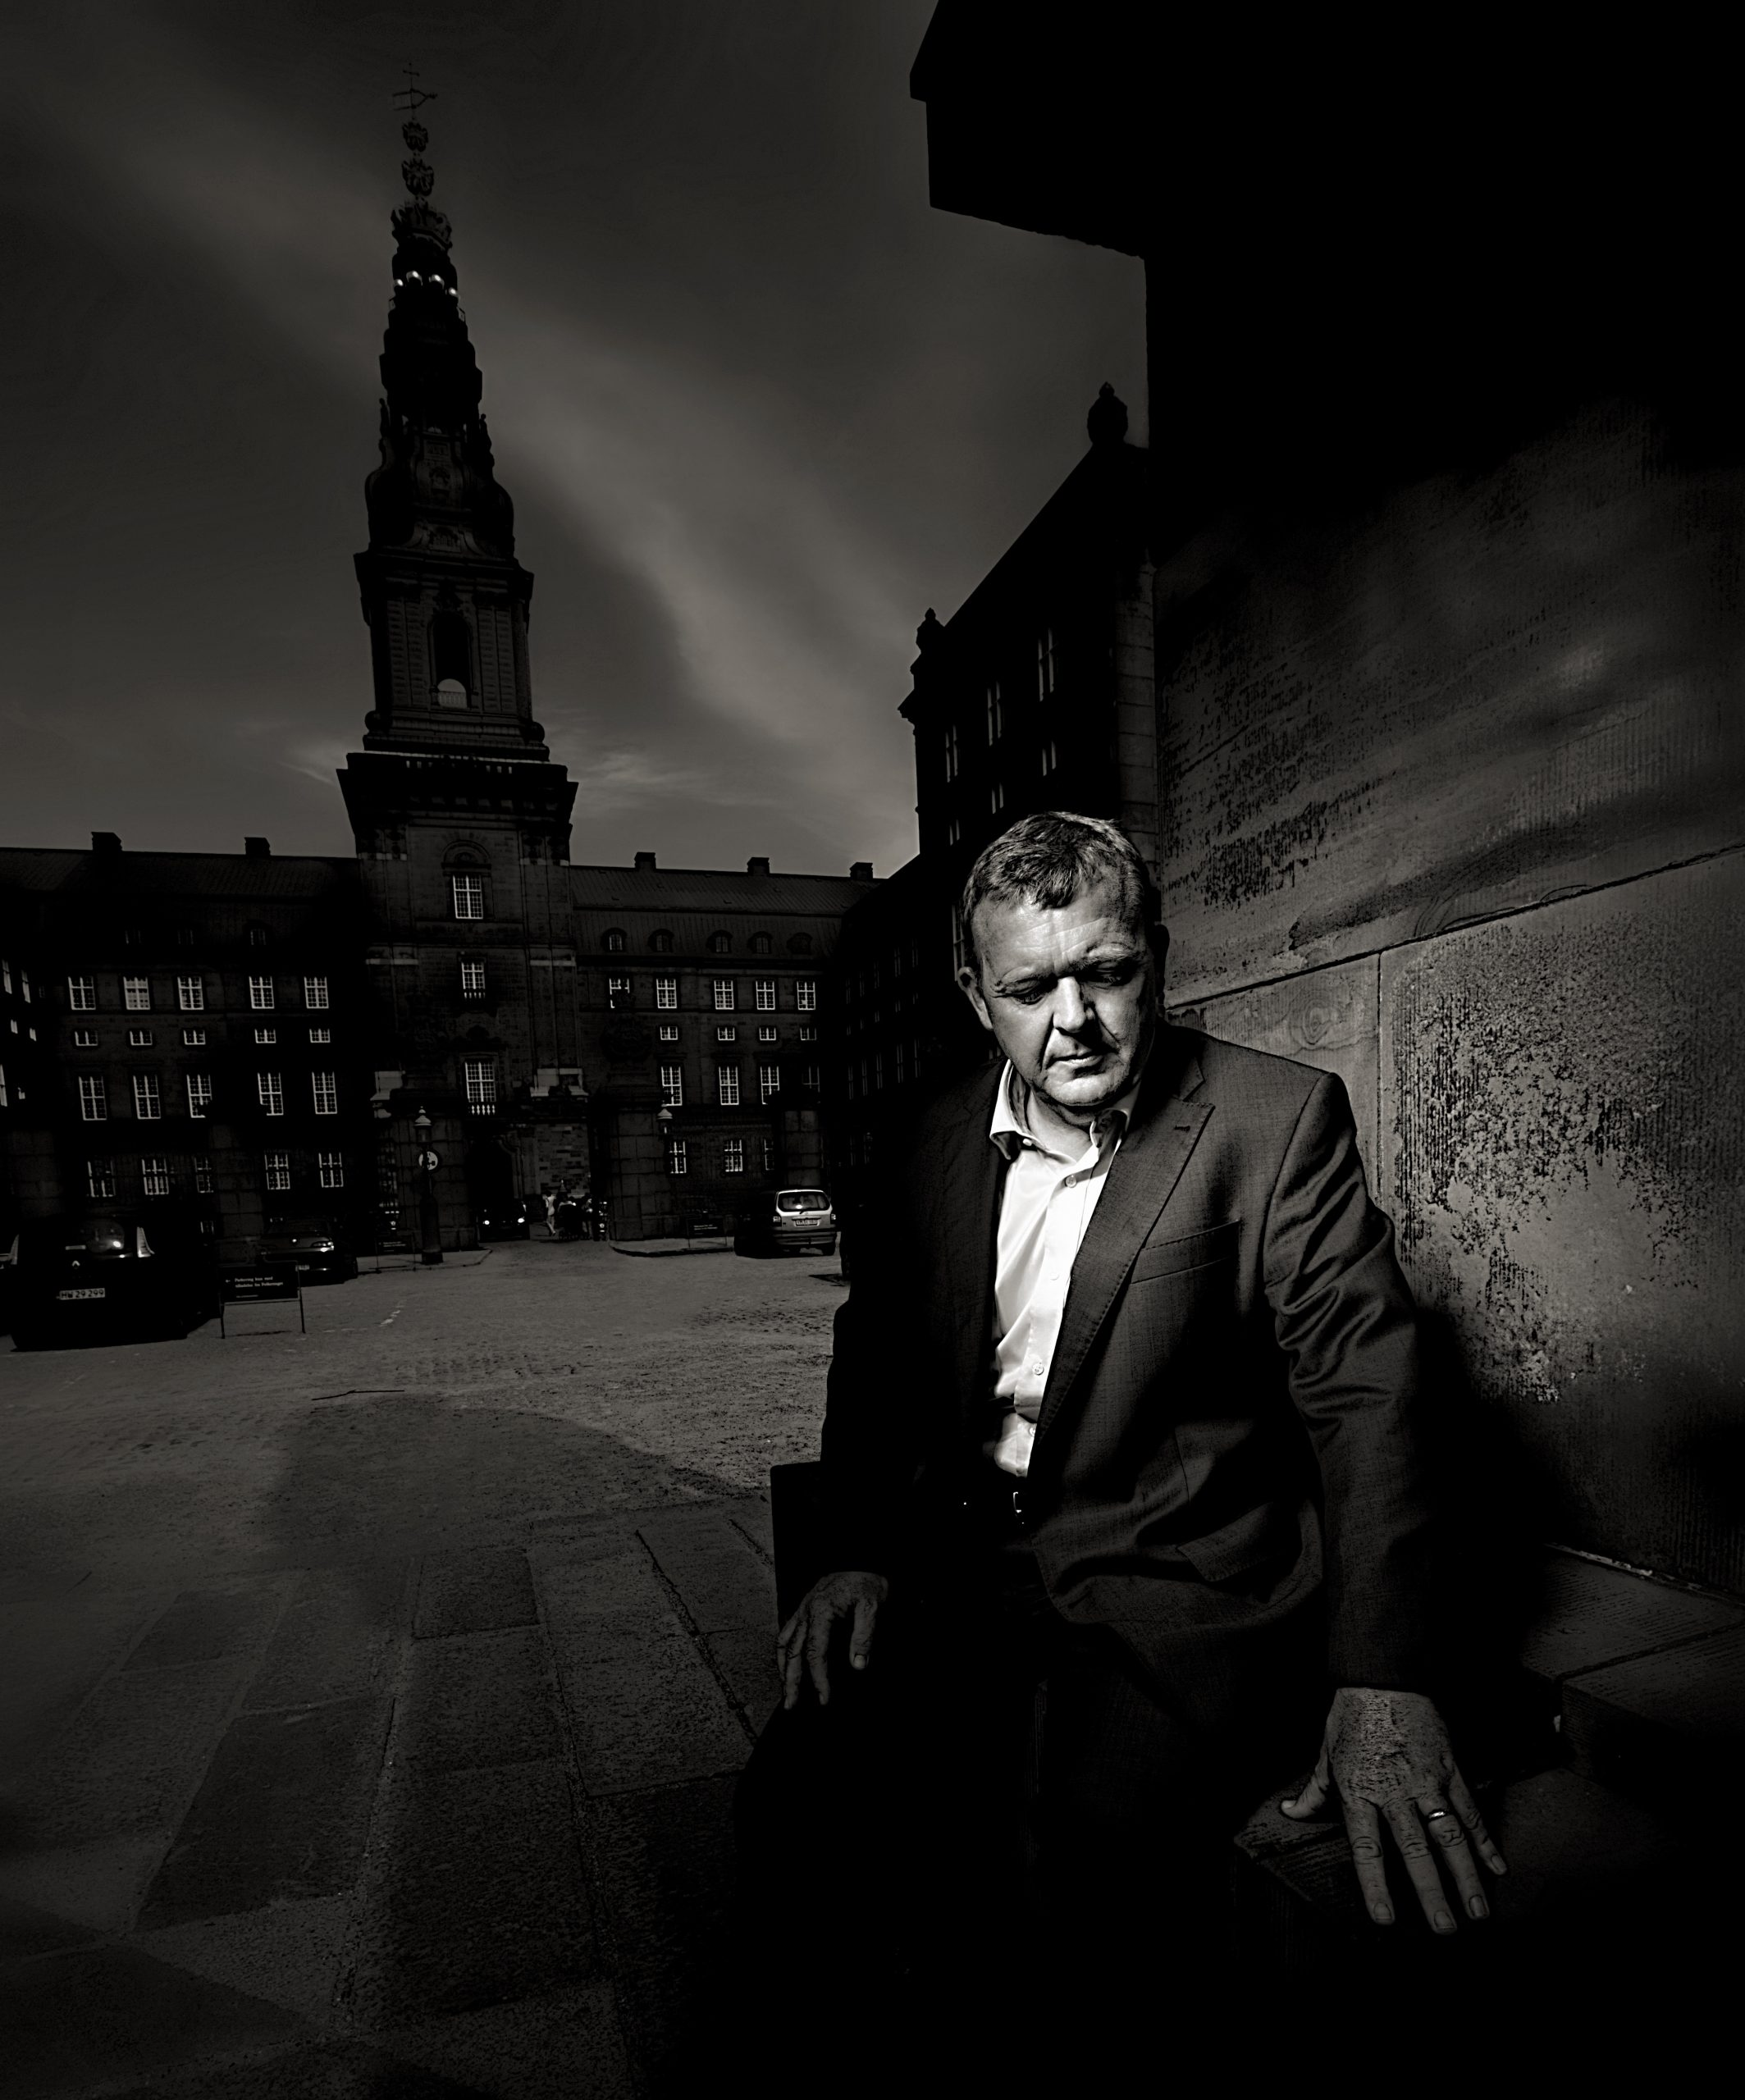 Foto: Claus Peuckert, Thrane Media